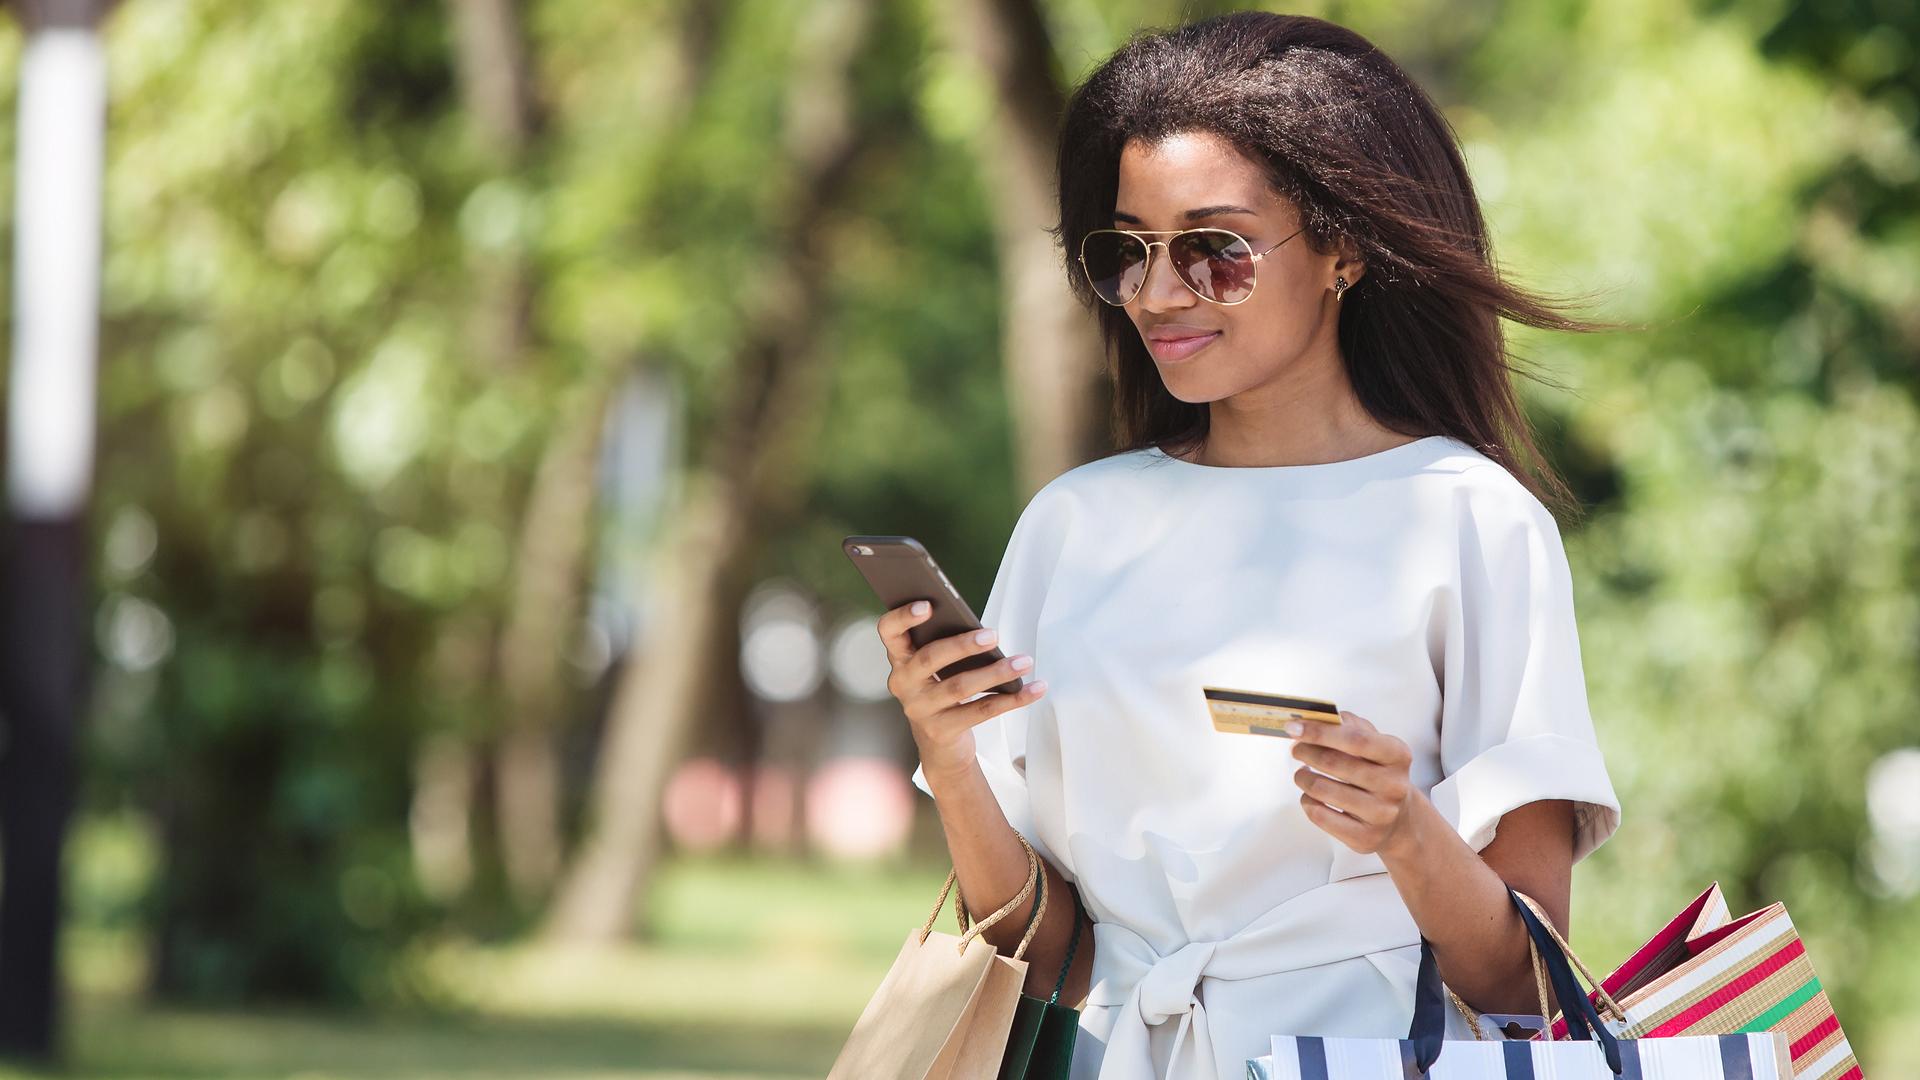 consumer-customer-mobile-shopping-ss-1920